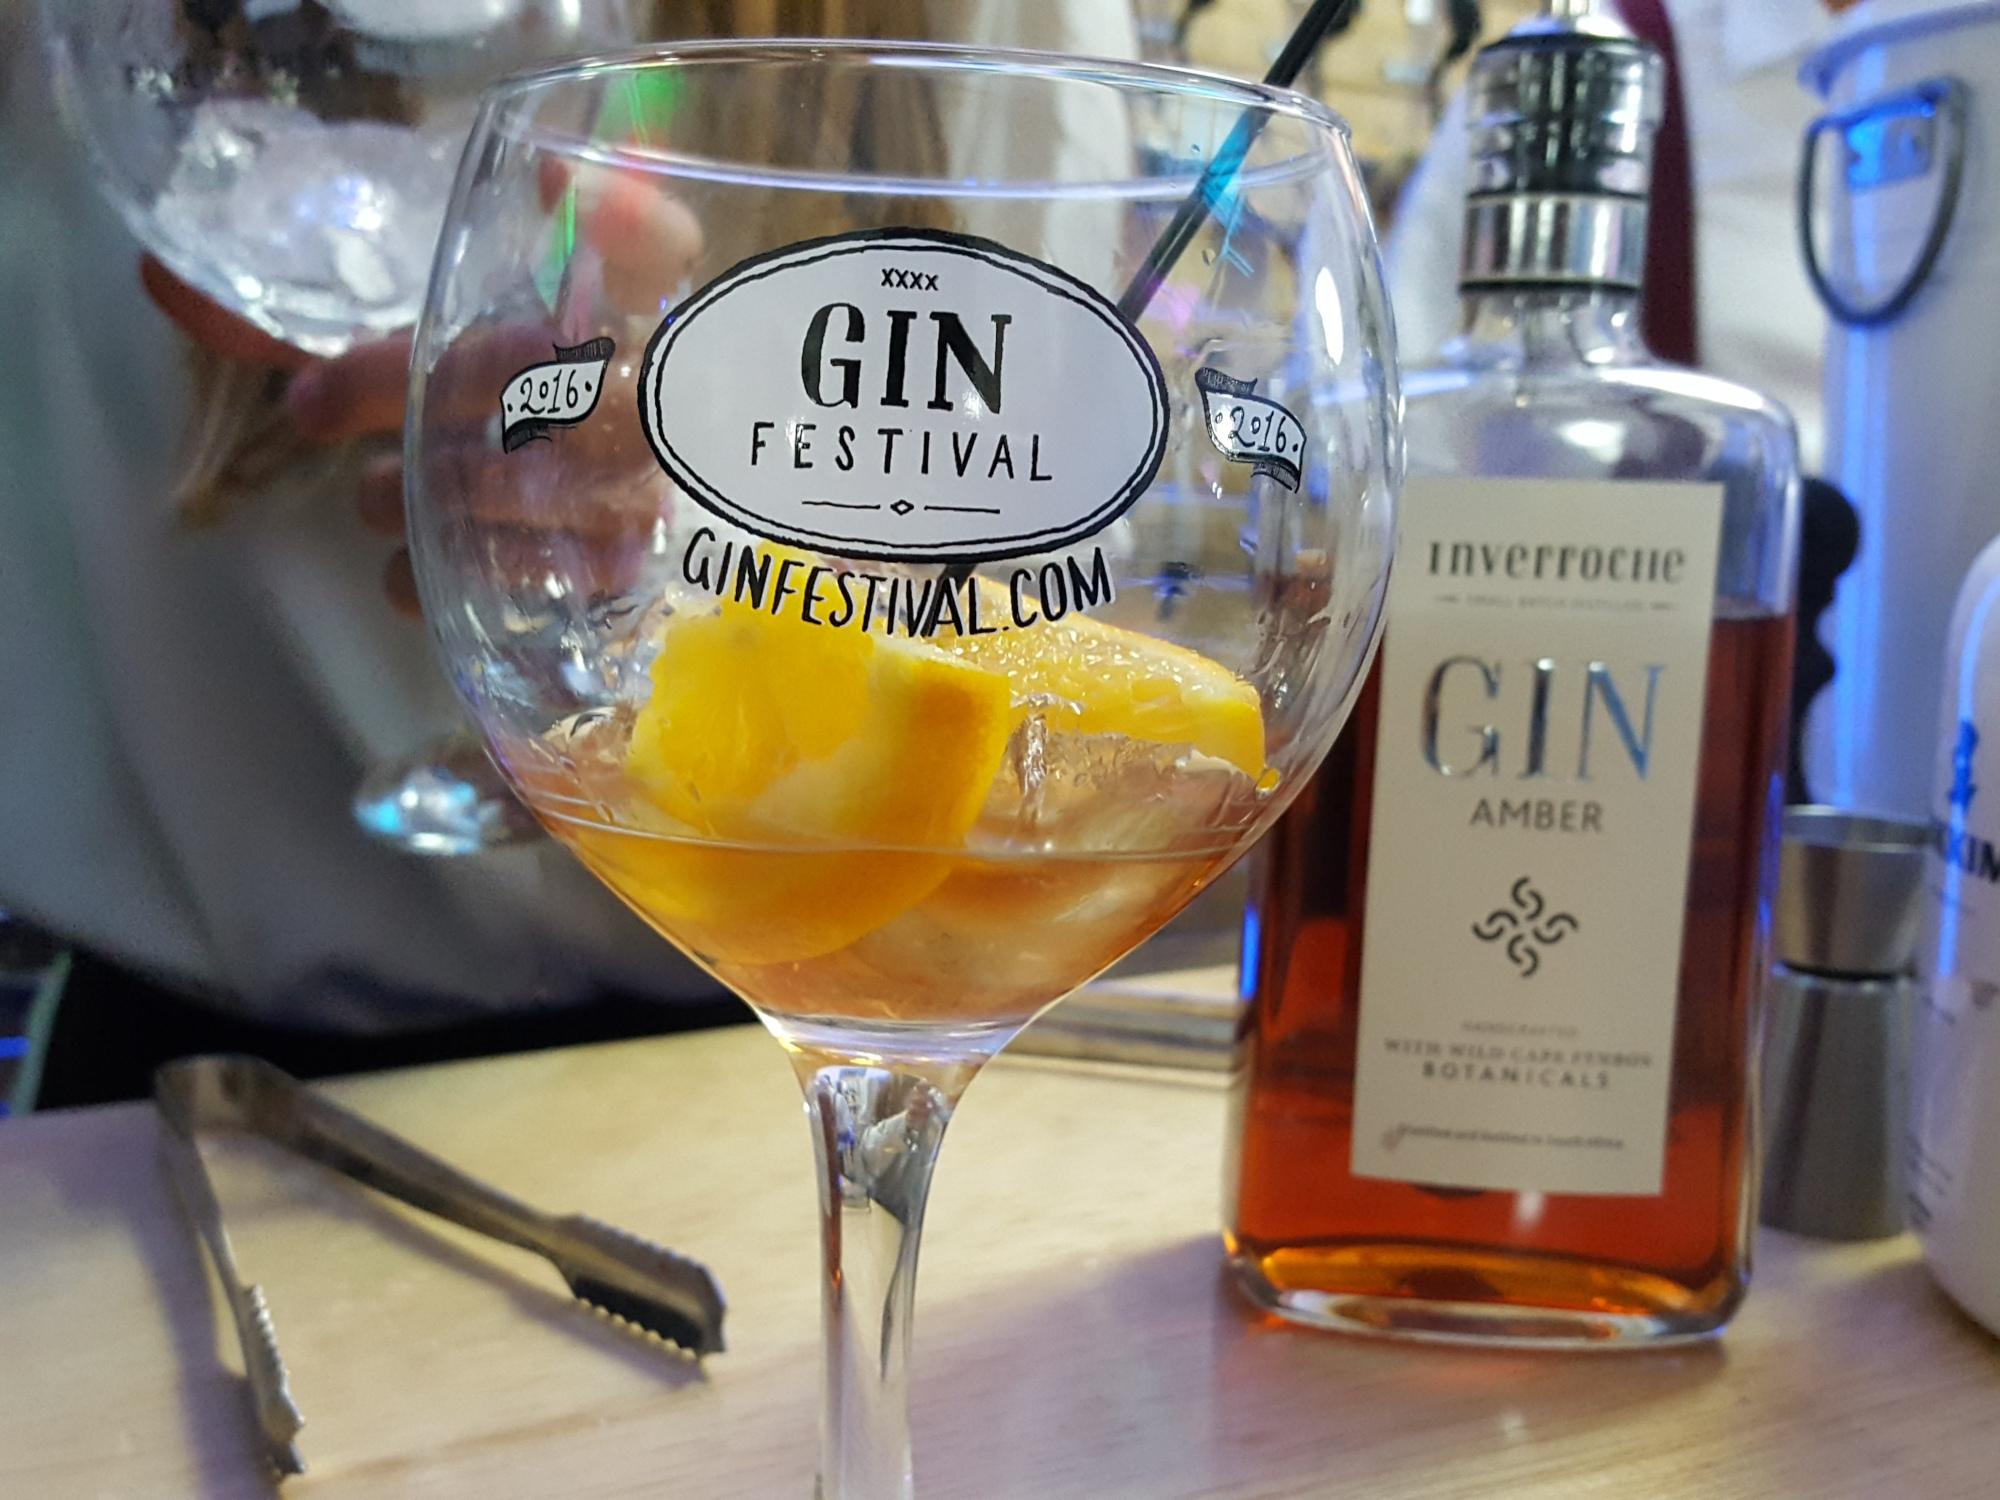 The Gin Festival Birmingham